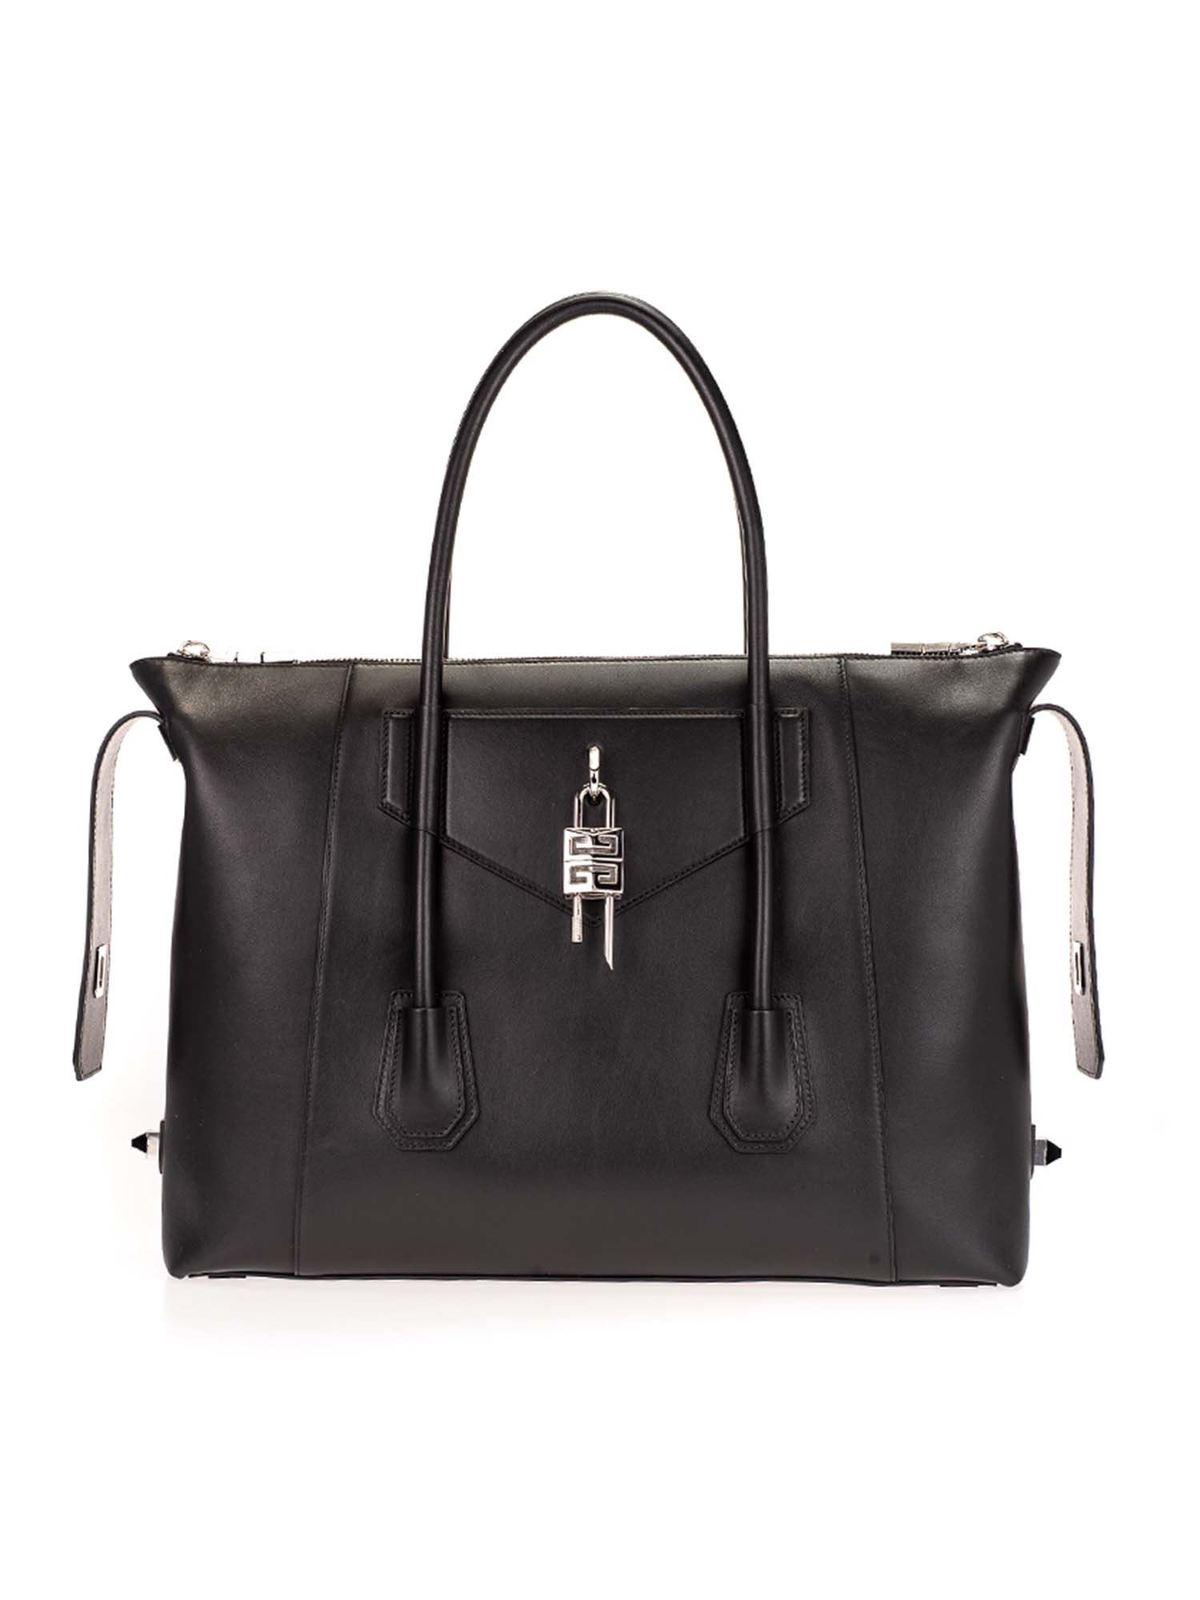 Givenchy Leathers MEDIUM ANTIGONA SOFT LOCK IN BLACK